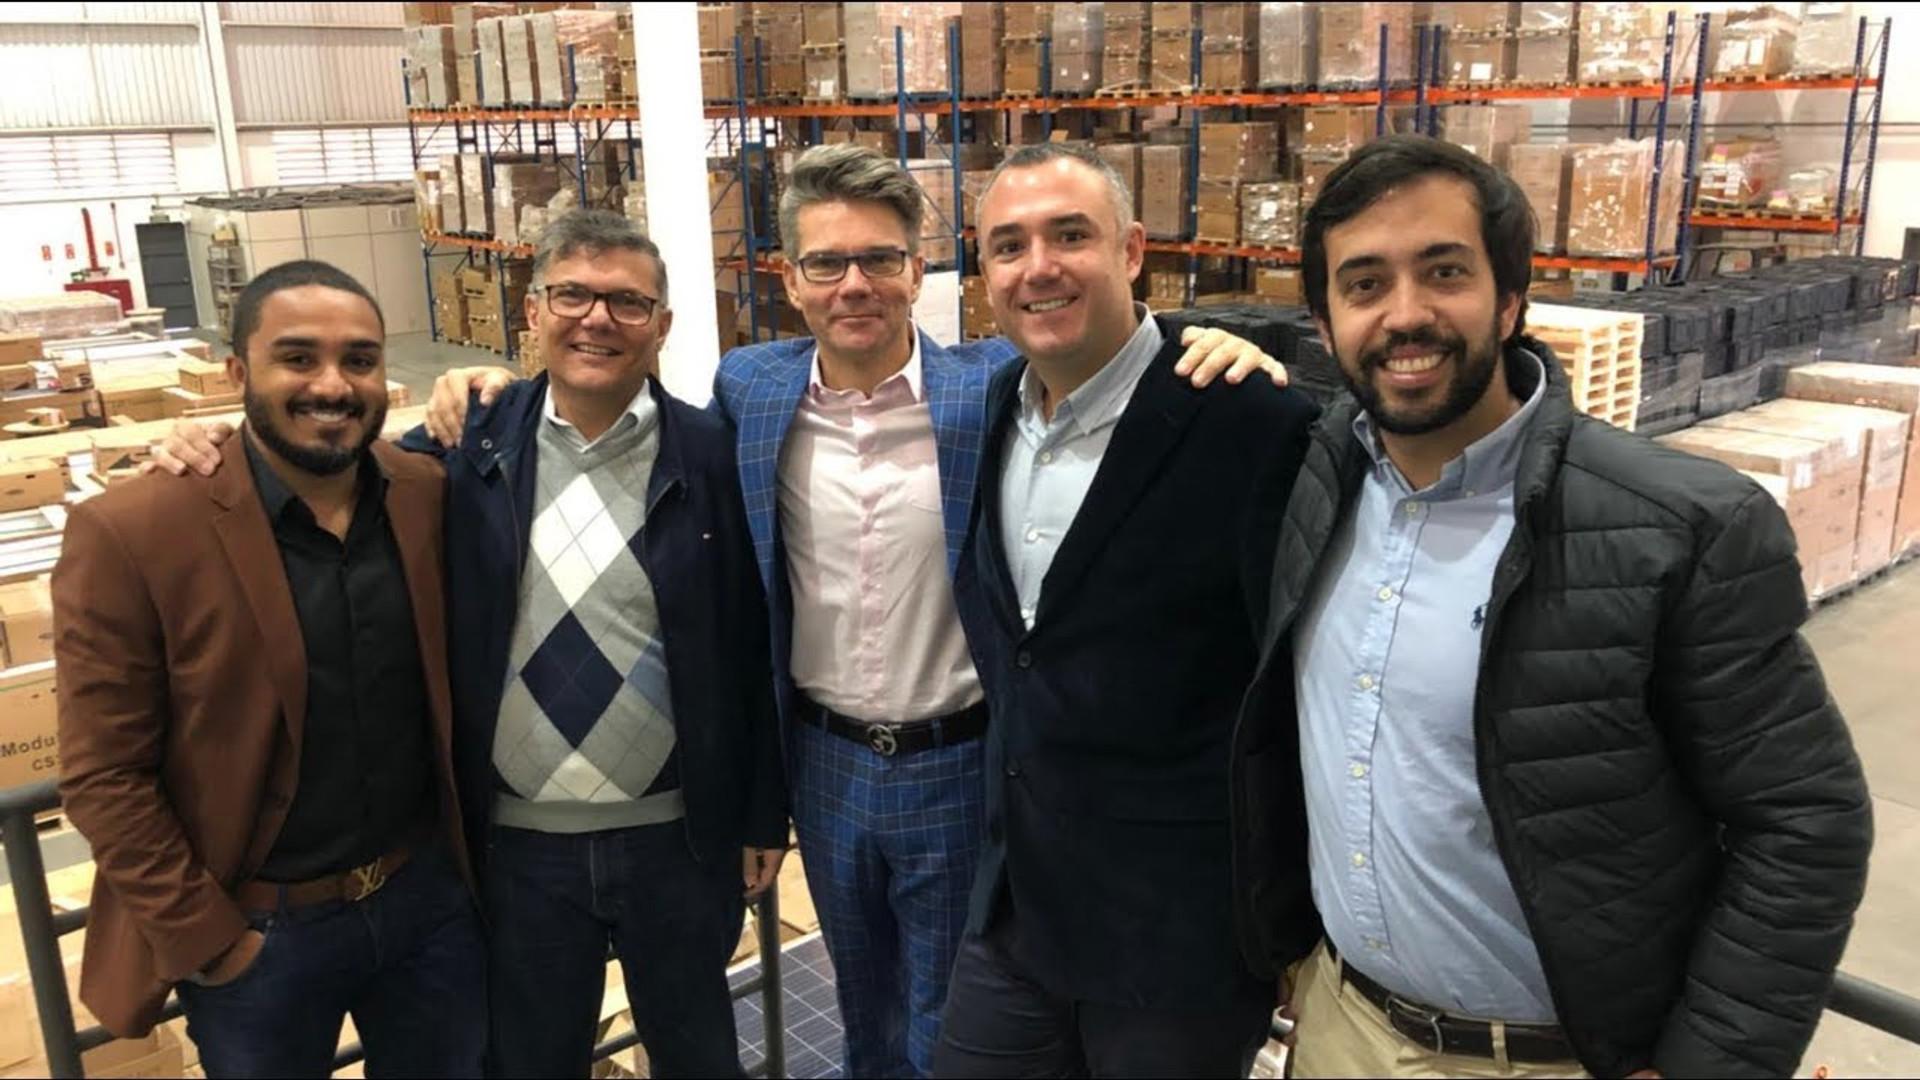 Solar Business Club in Latin America: Sharing the Knowledge - Leonardo Curioni, Chair